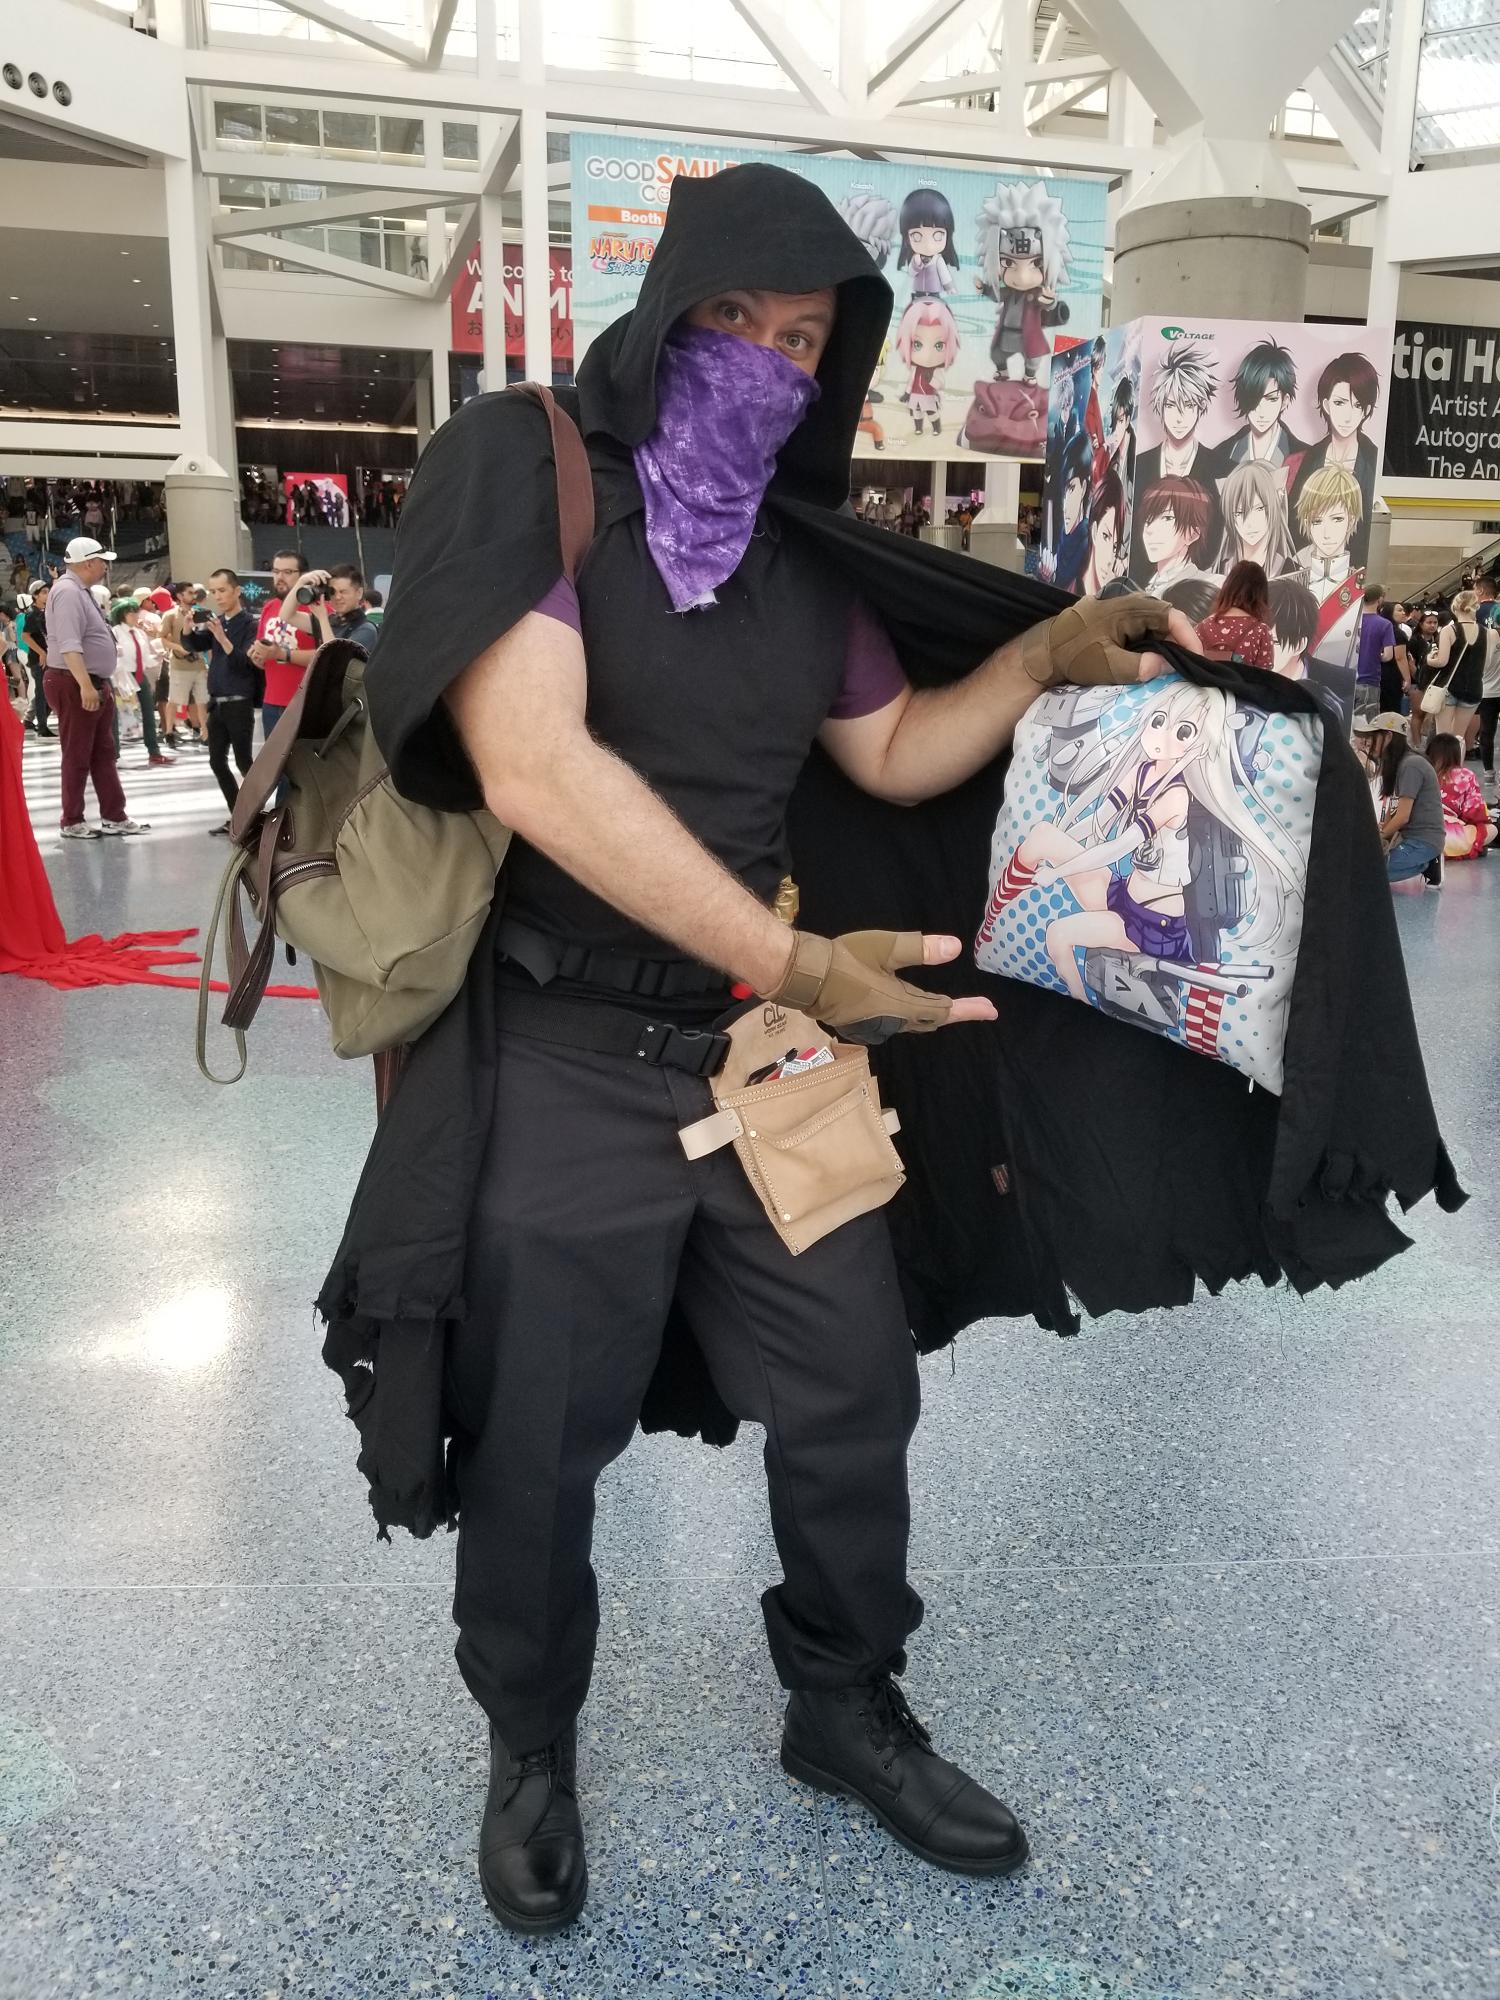 Got A Lot Of Good Things For Sale Stranger Resident Evil 4 Merchant Cosplay At Anime Expo 2018 Resident Evil